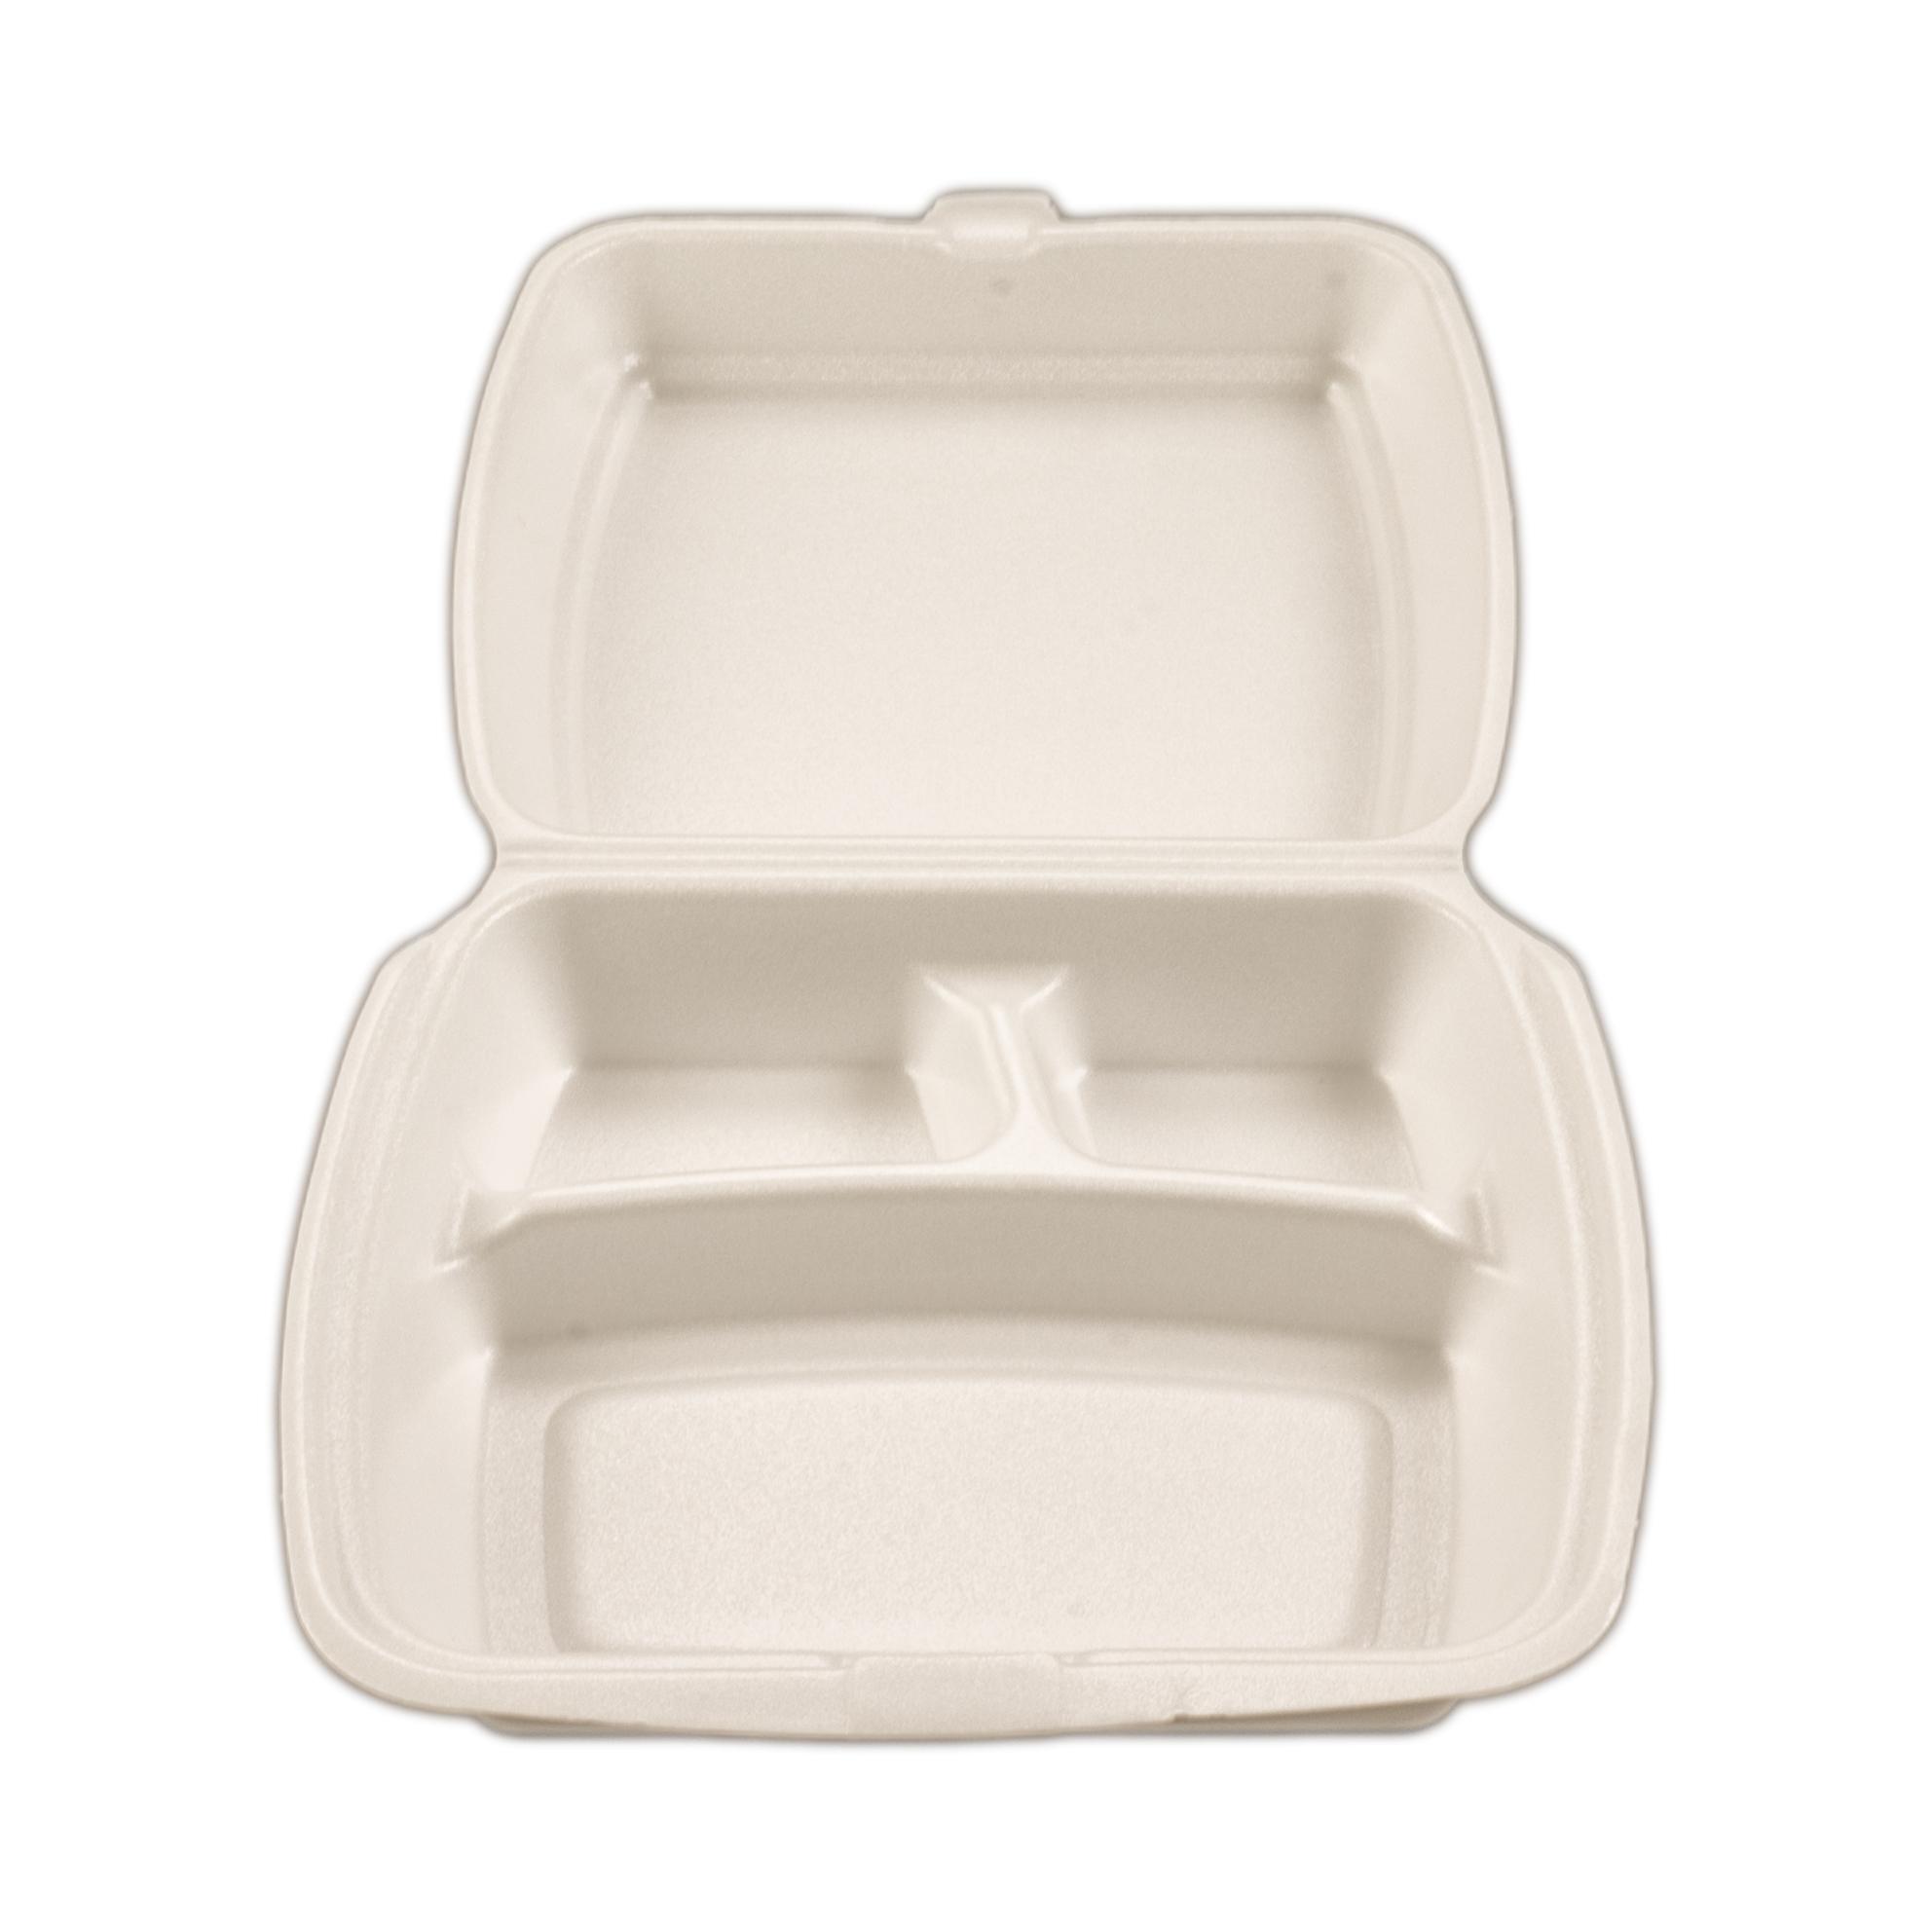 iK-FC5      Foam Clam Dinner Pack 3 Compartment    233 x 483 x 42mm 100 per slv 200 per carton